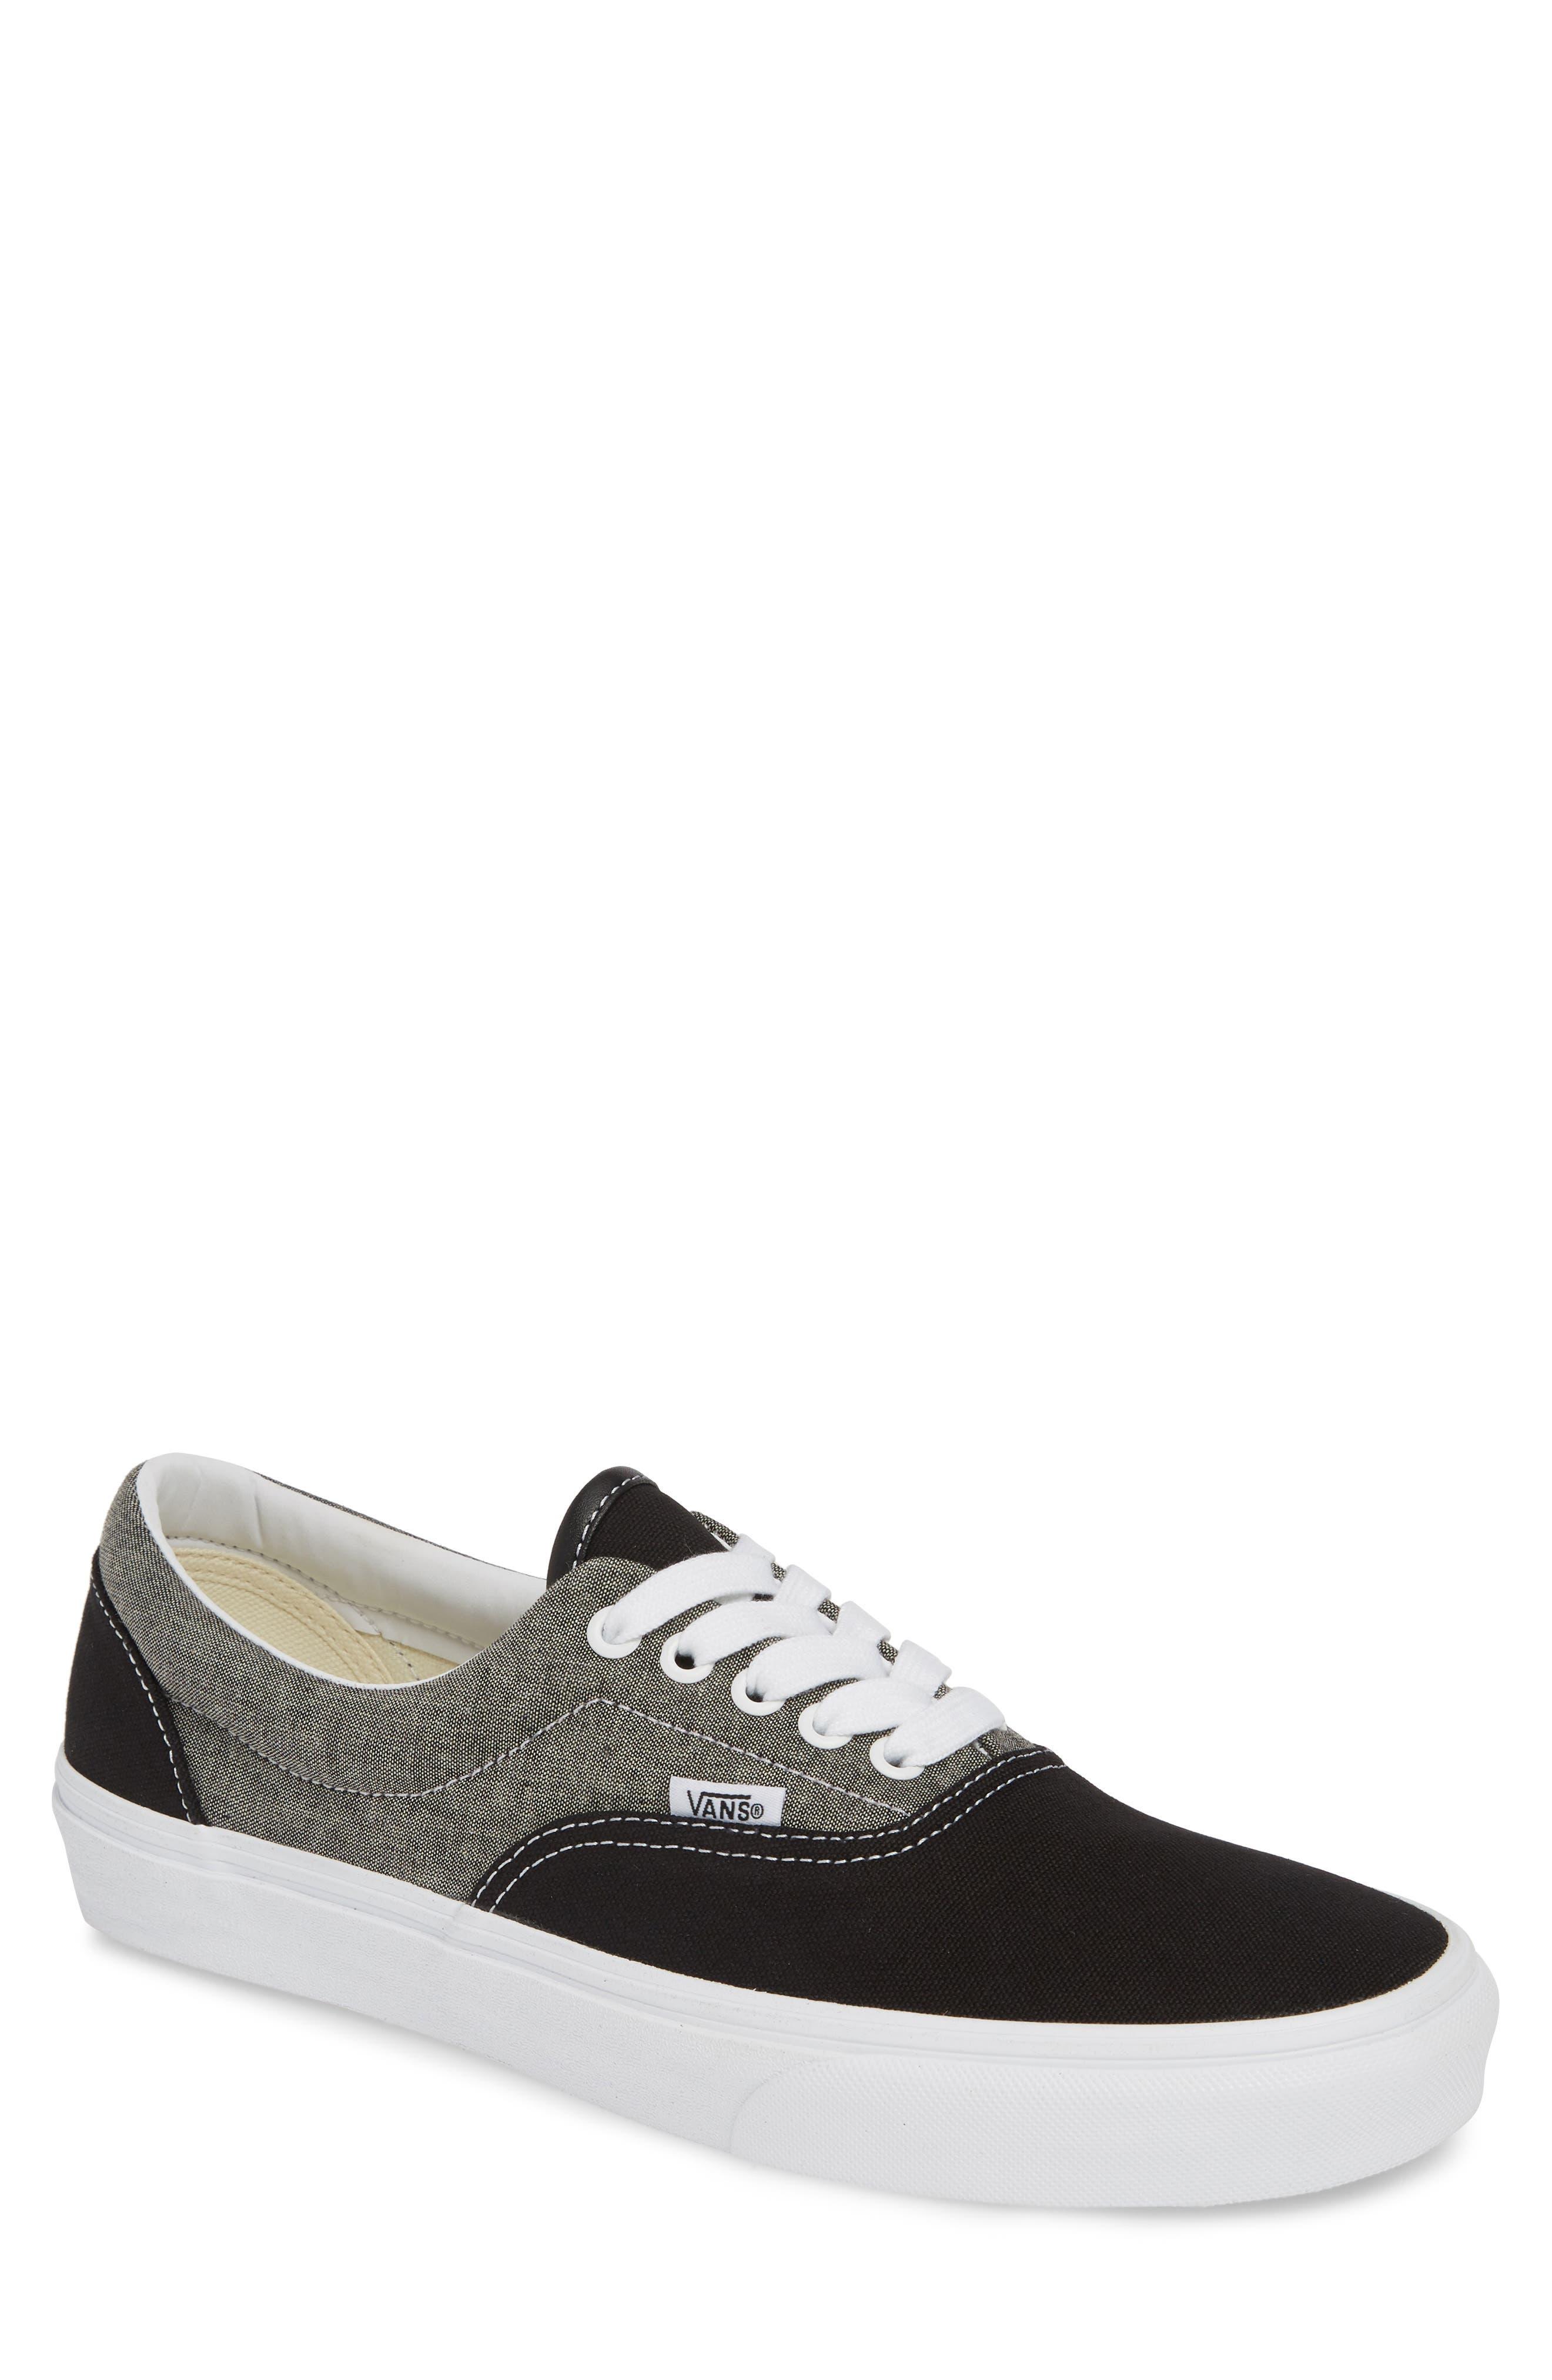 8f9c196f92 Vans Men s White Shoes   Fashion